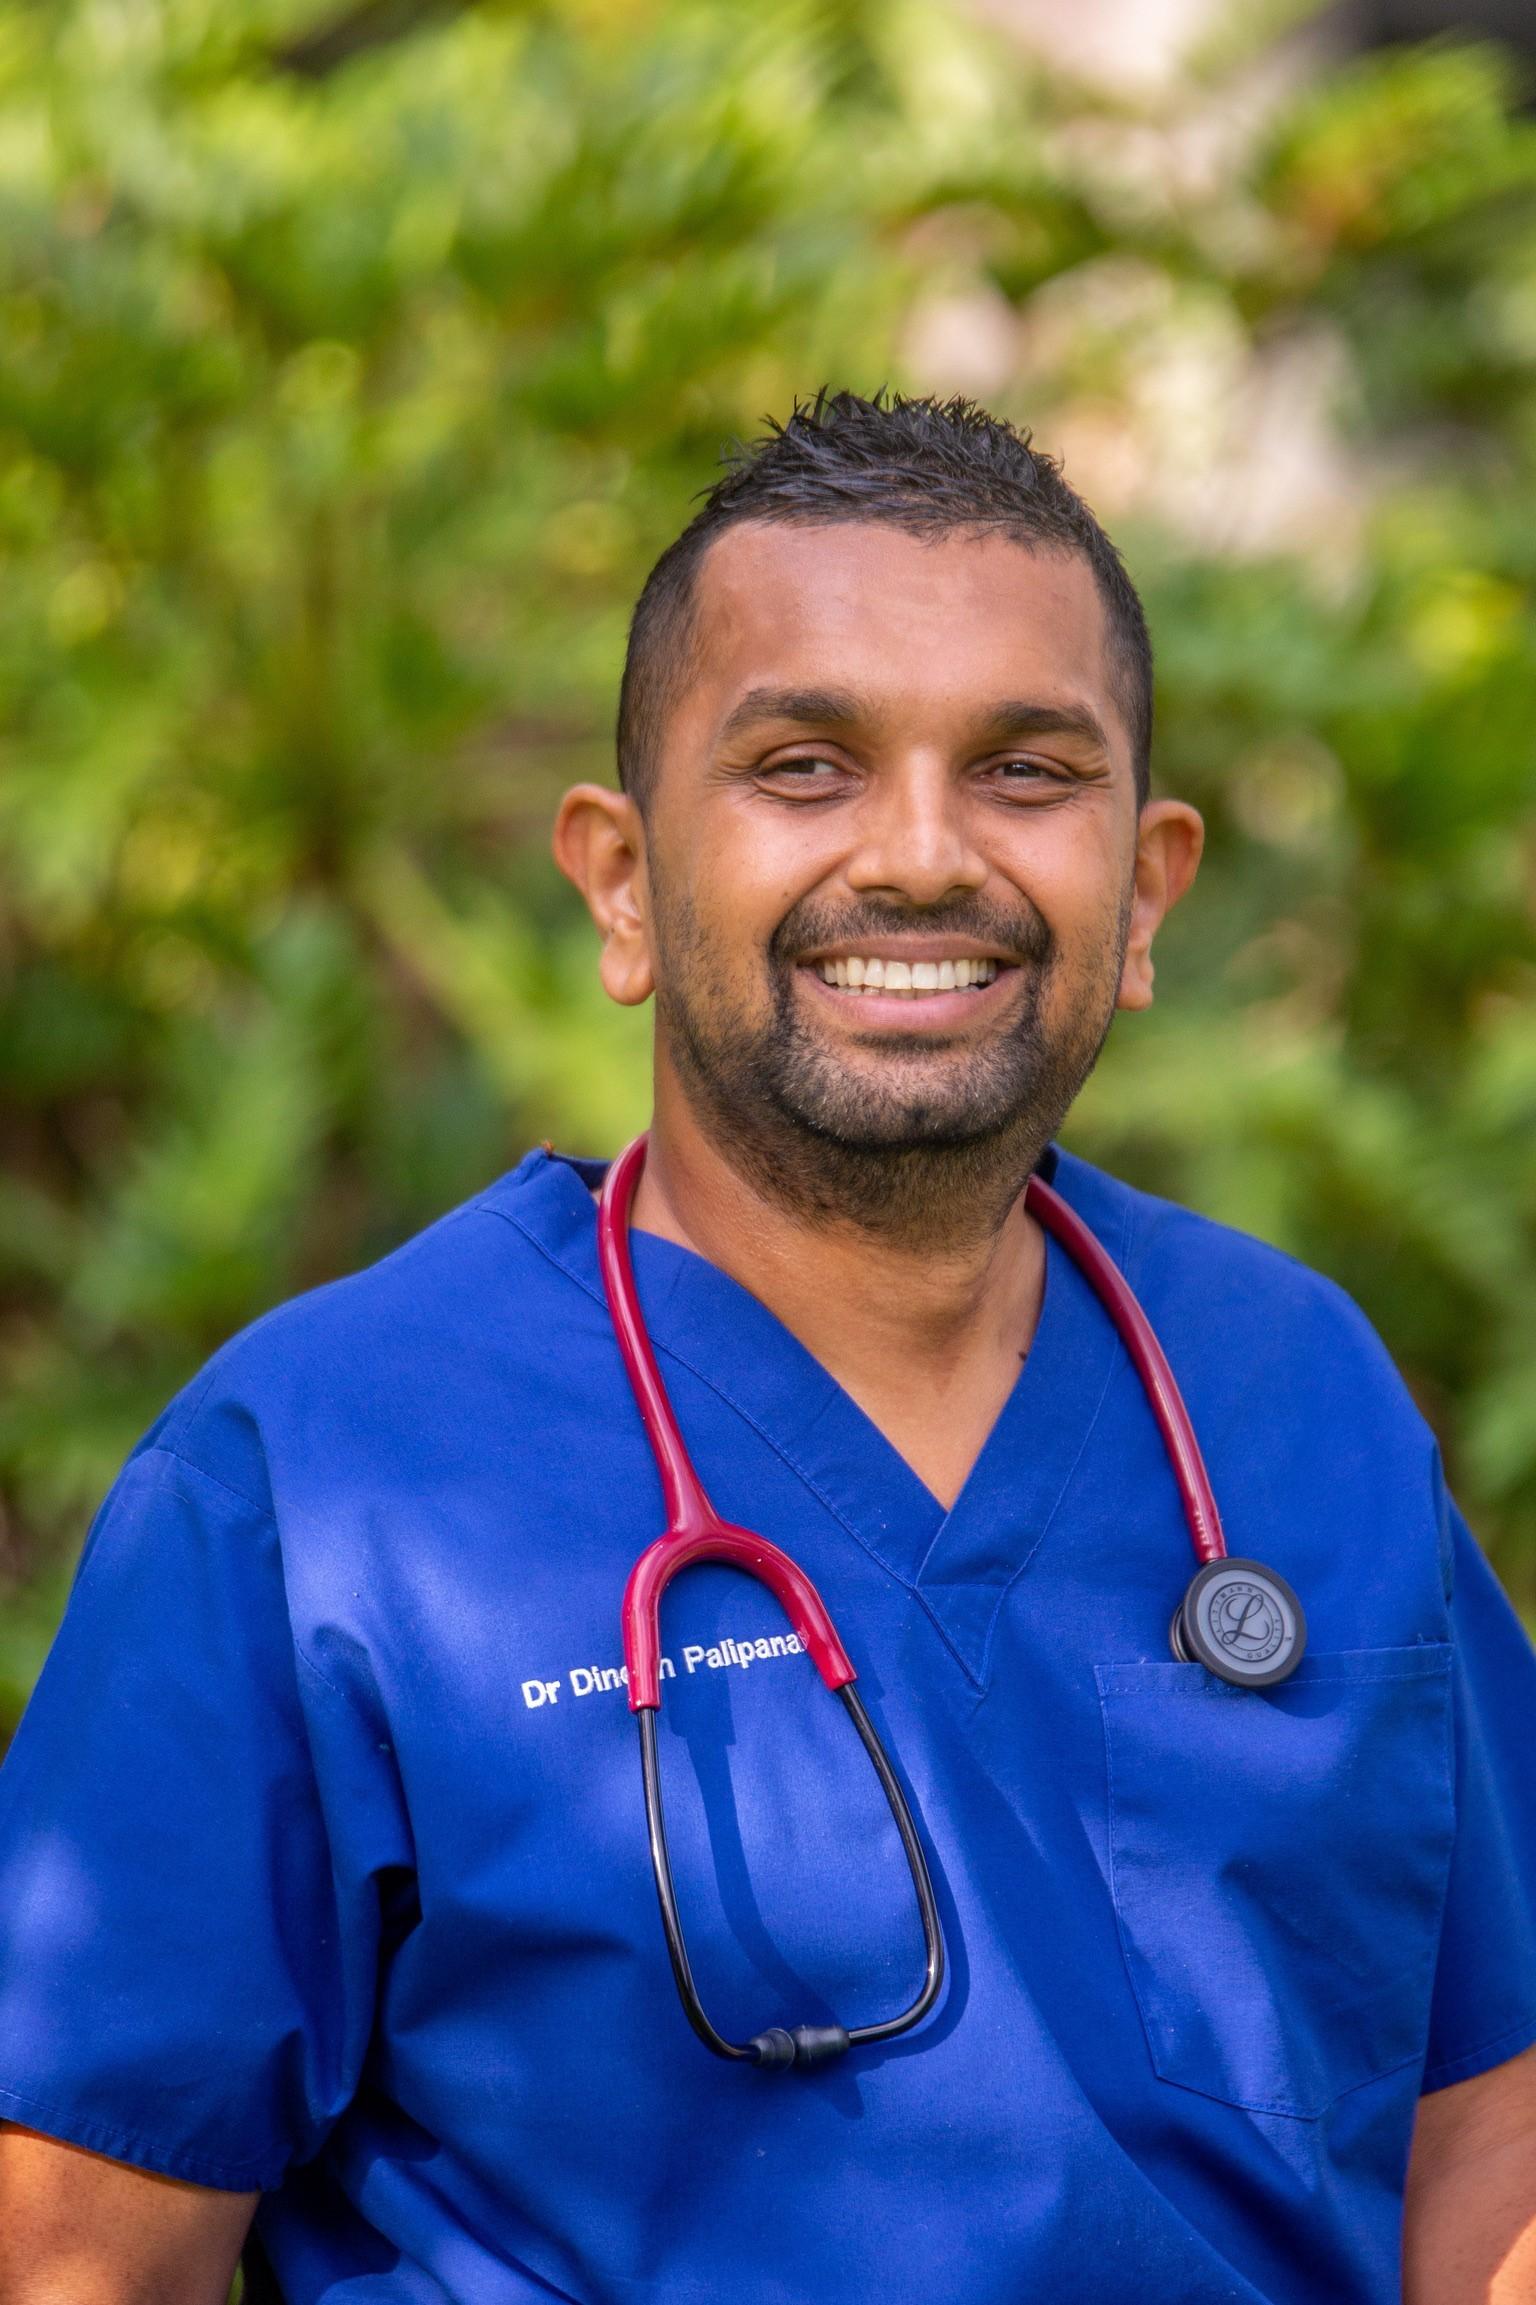 Dr. Dinesh Palipana